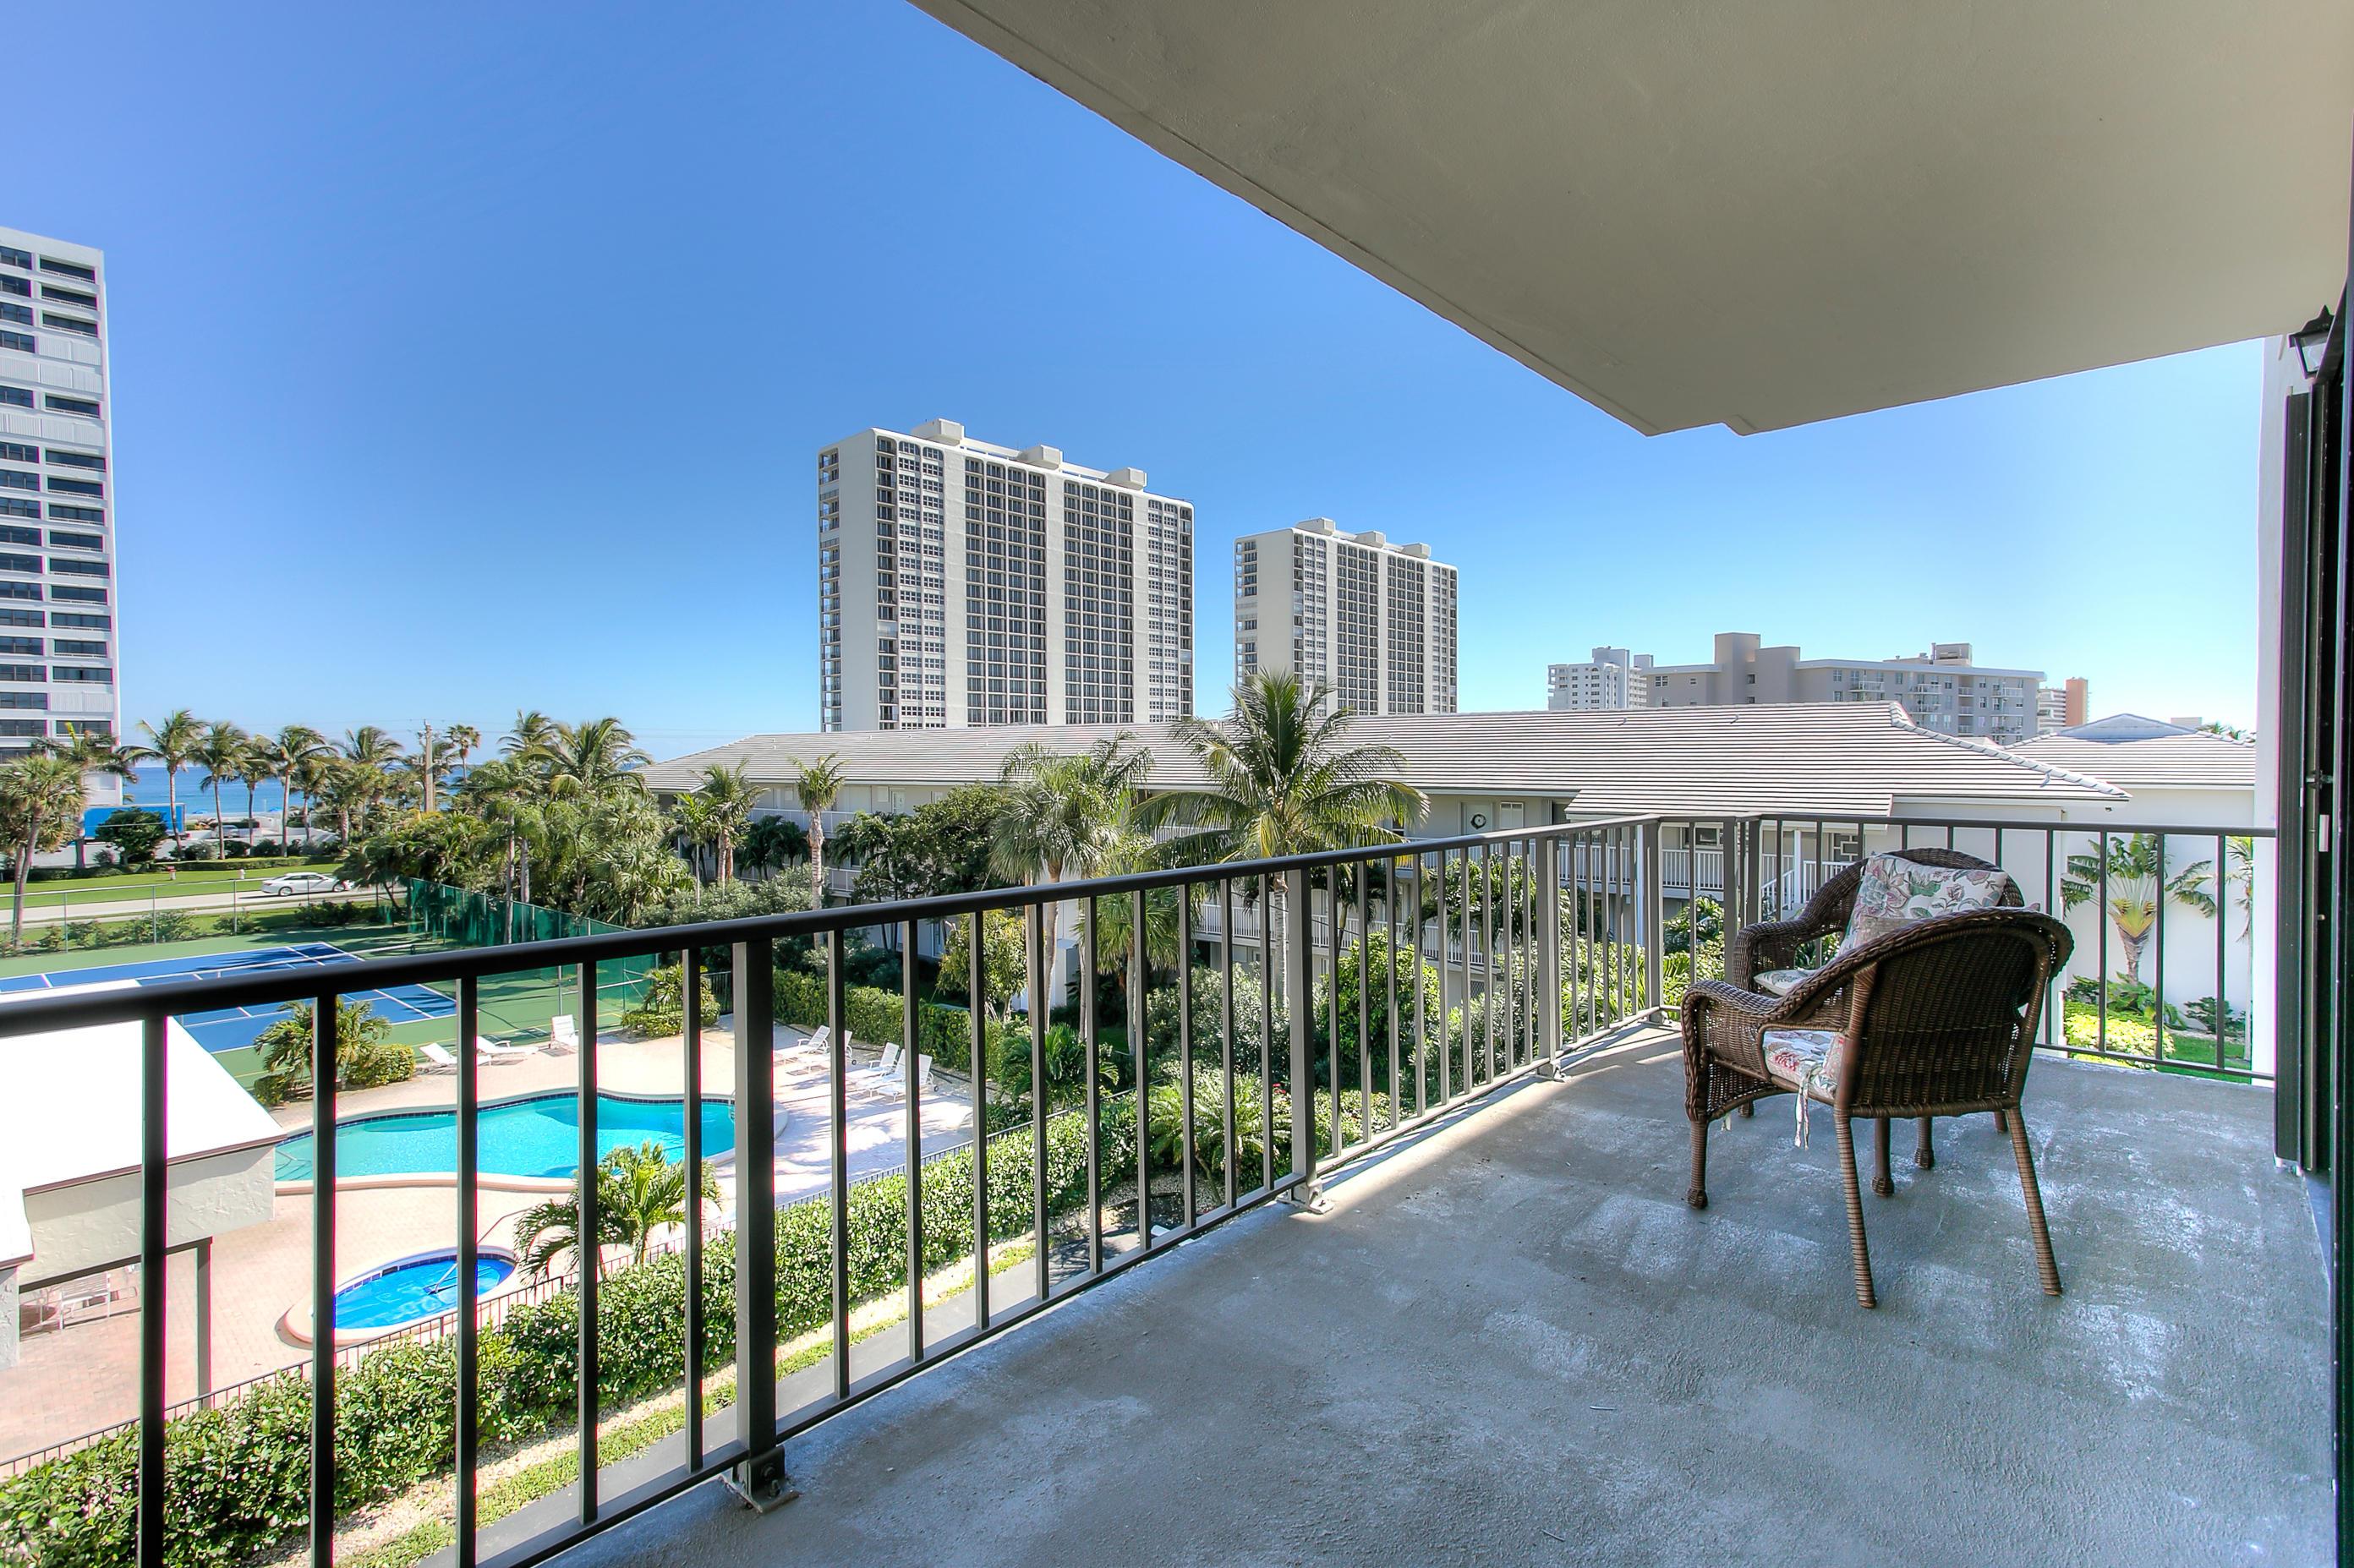 2679 S Ocean Boulevard #0041 Boca Raton, FL 33432